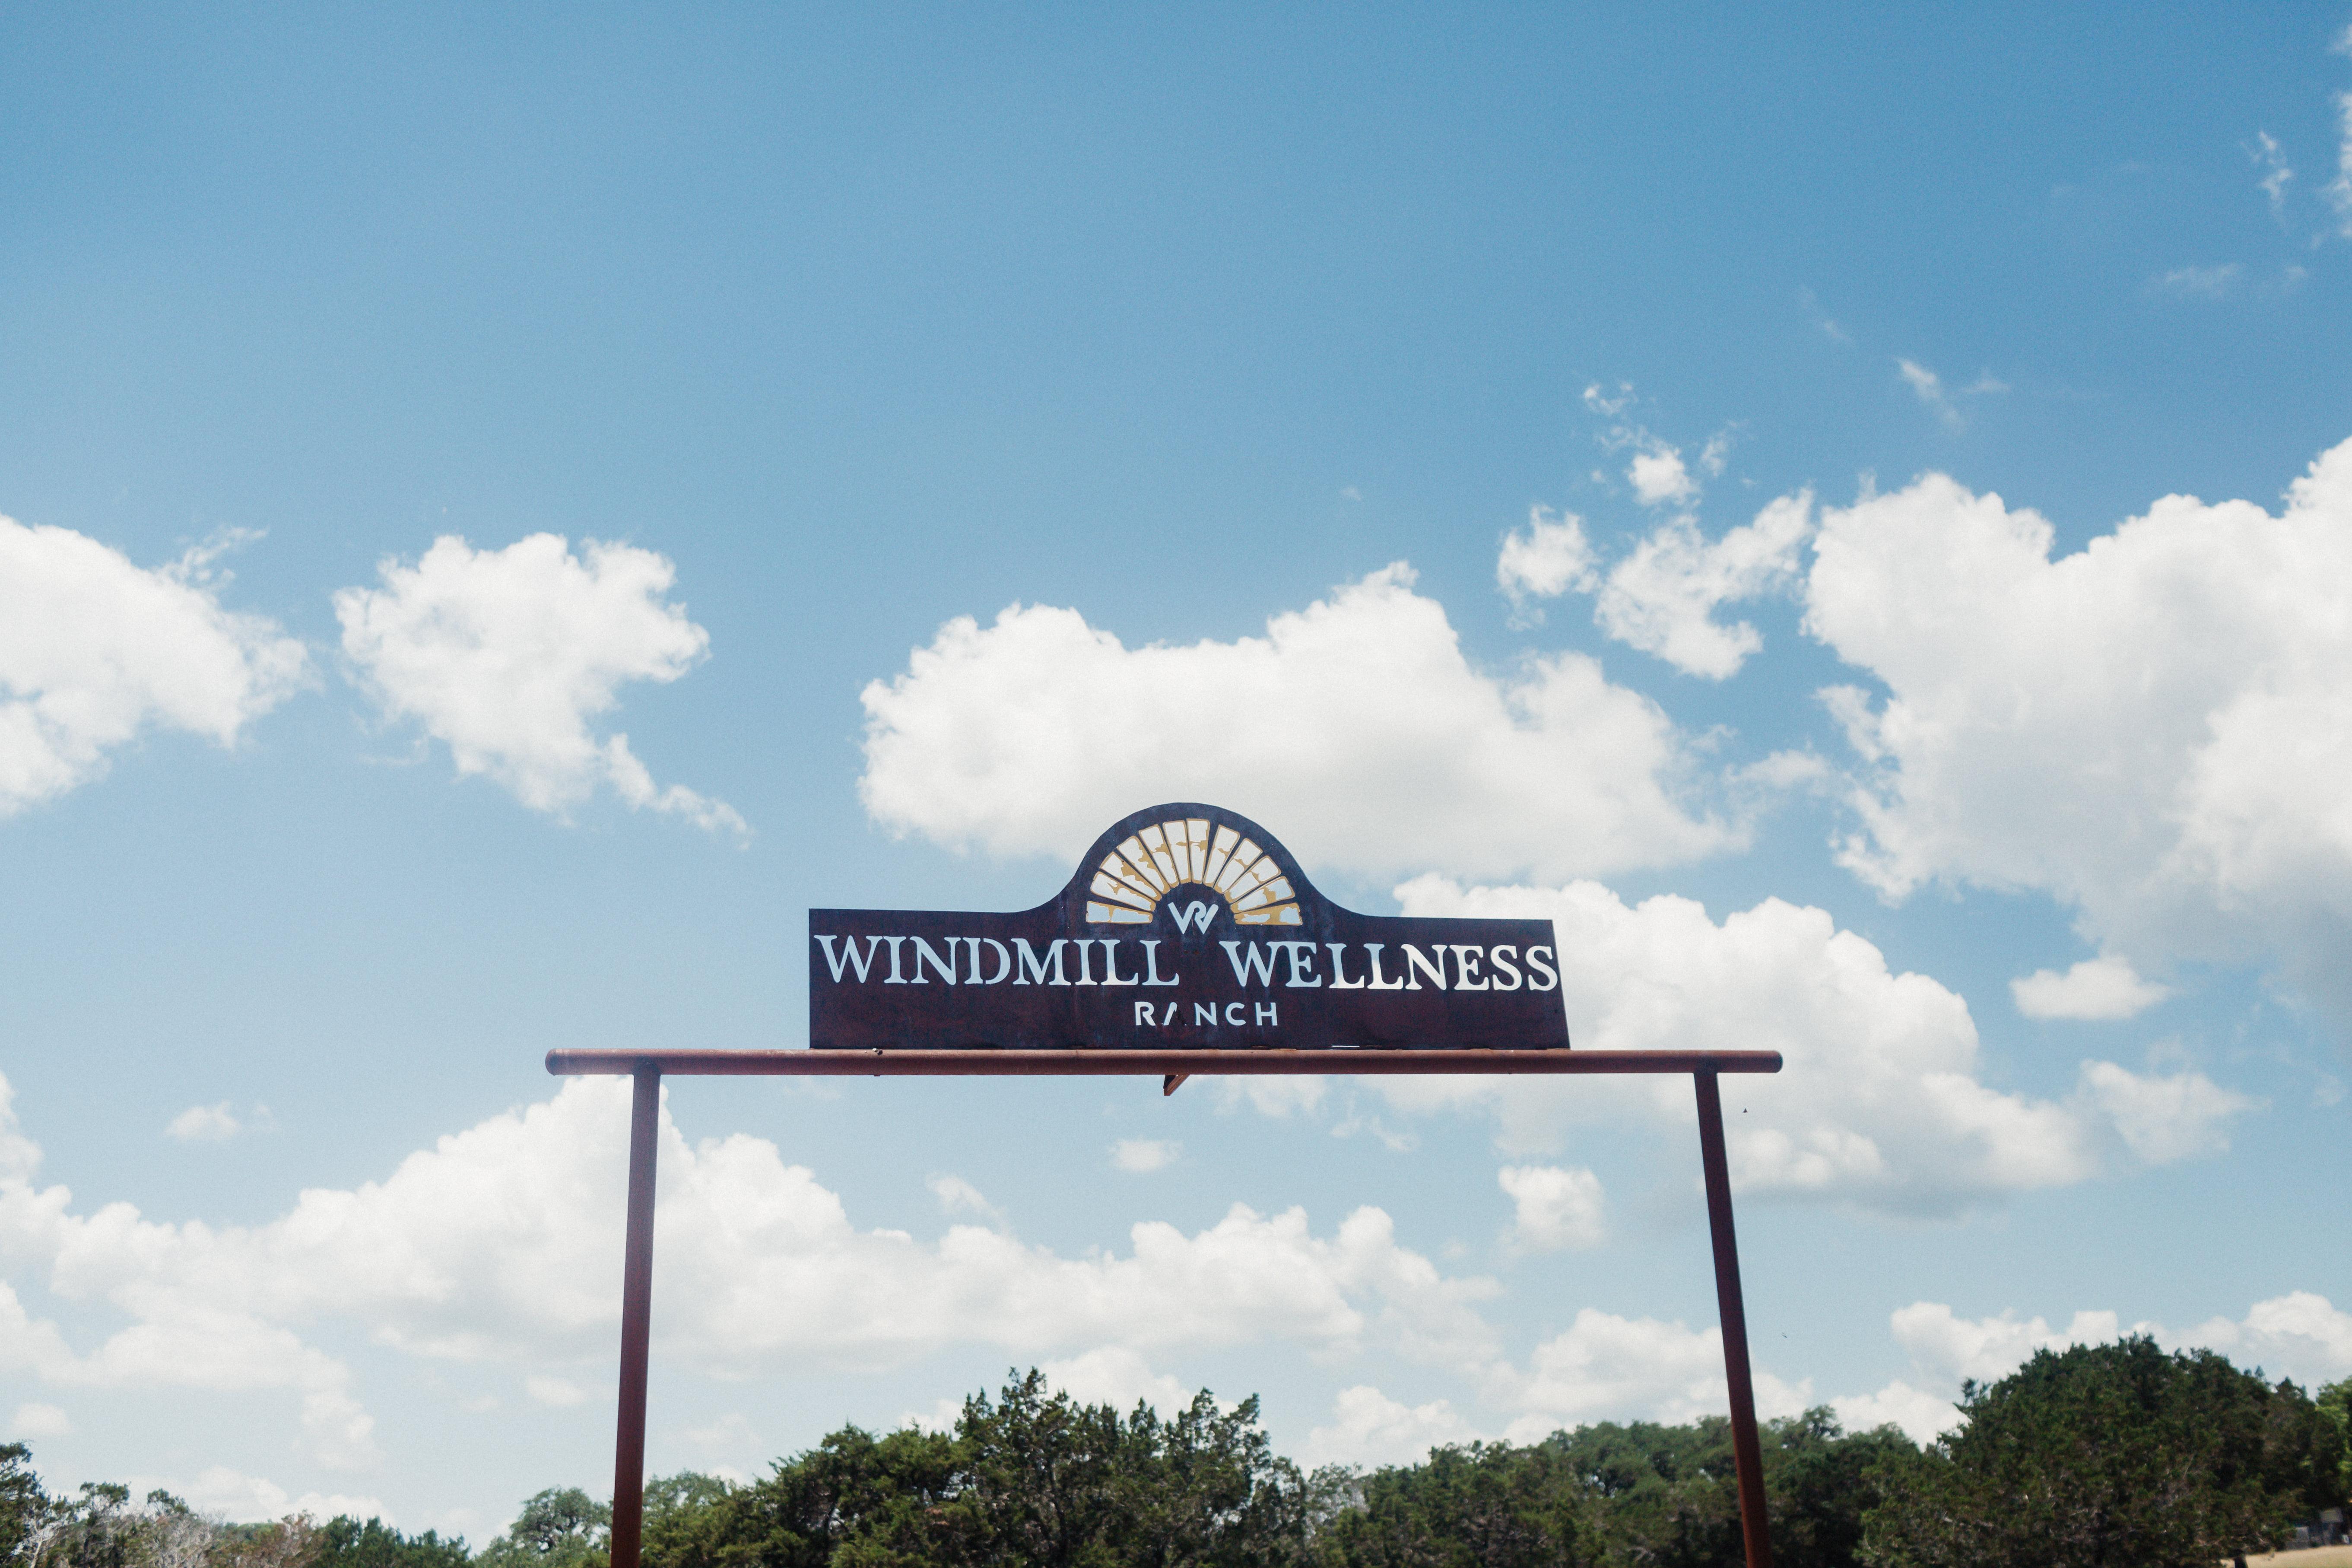 Windmill Wellness Ranch Logo